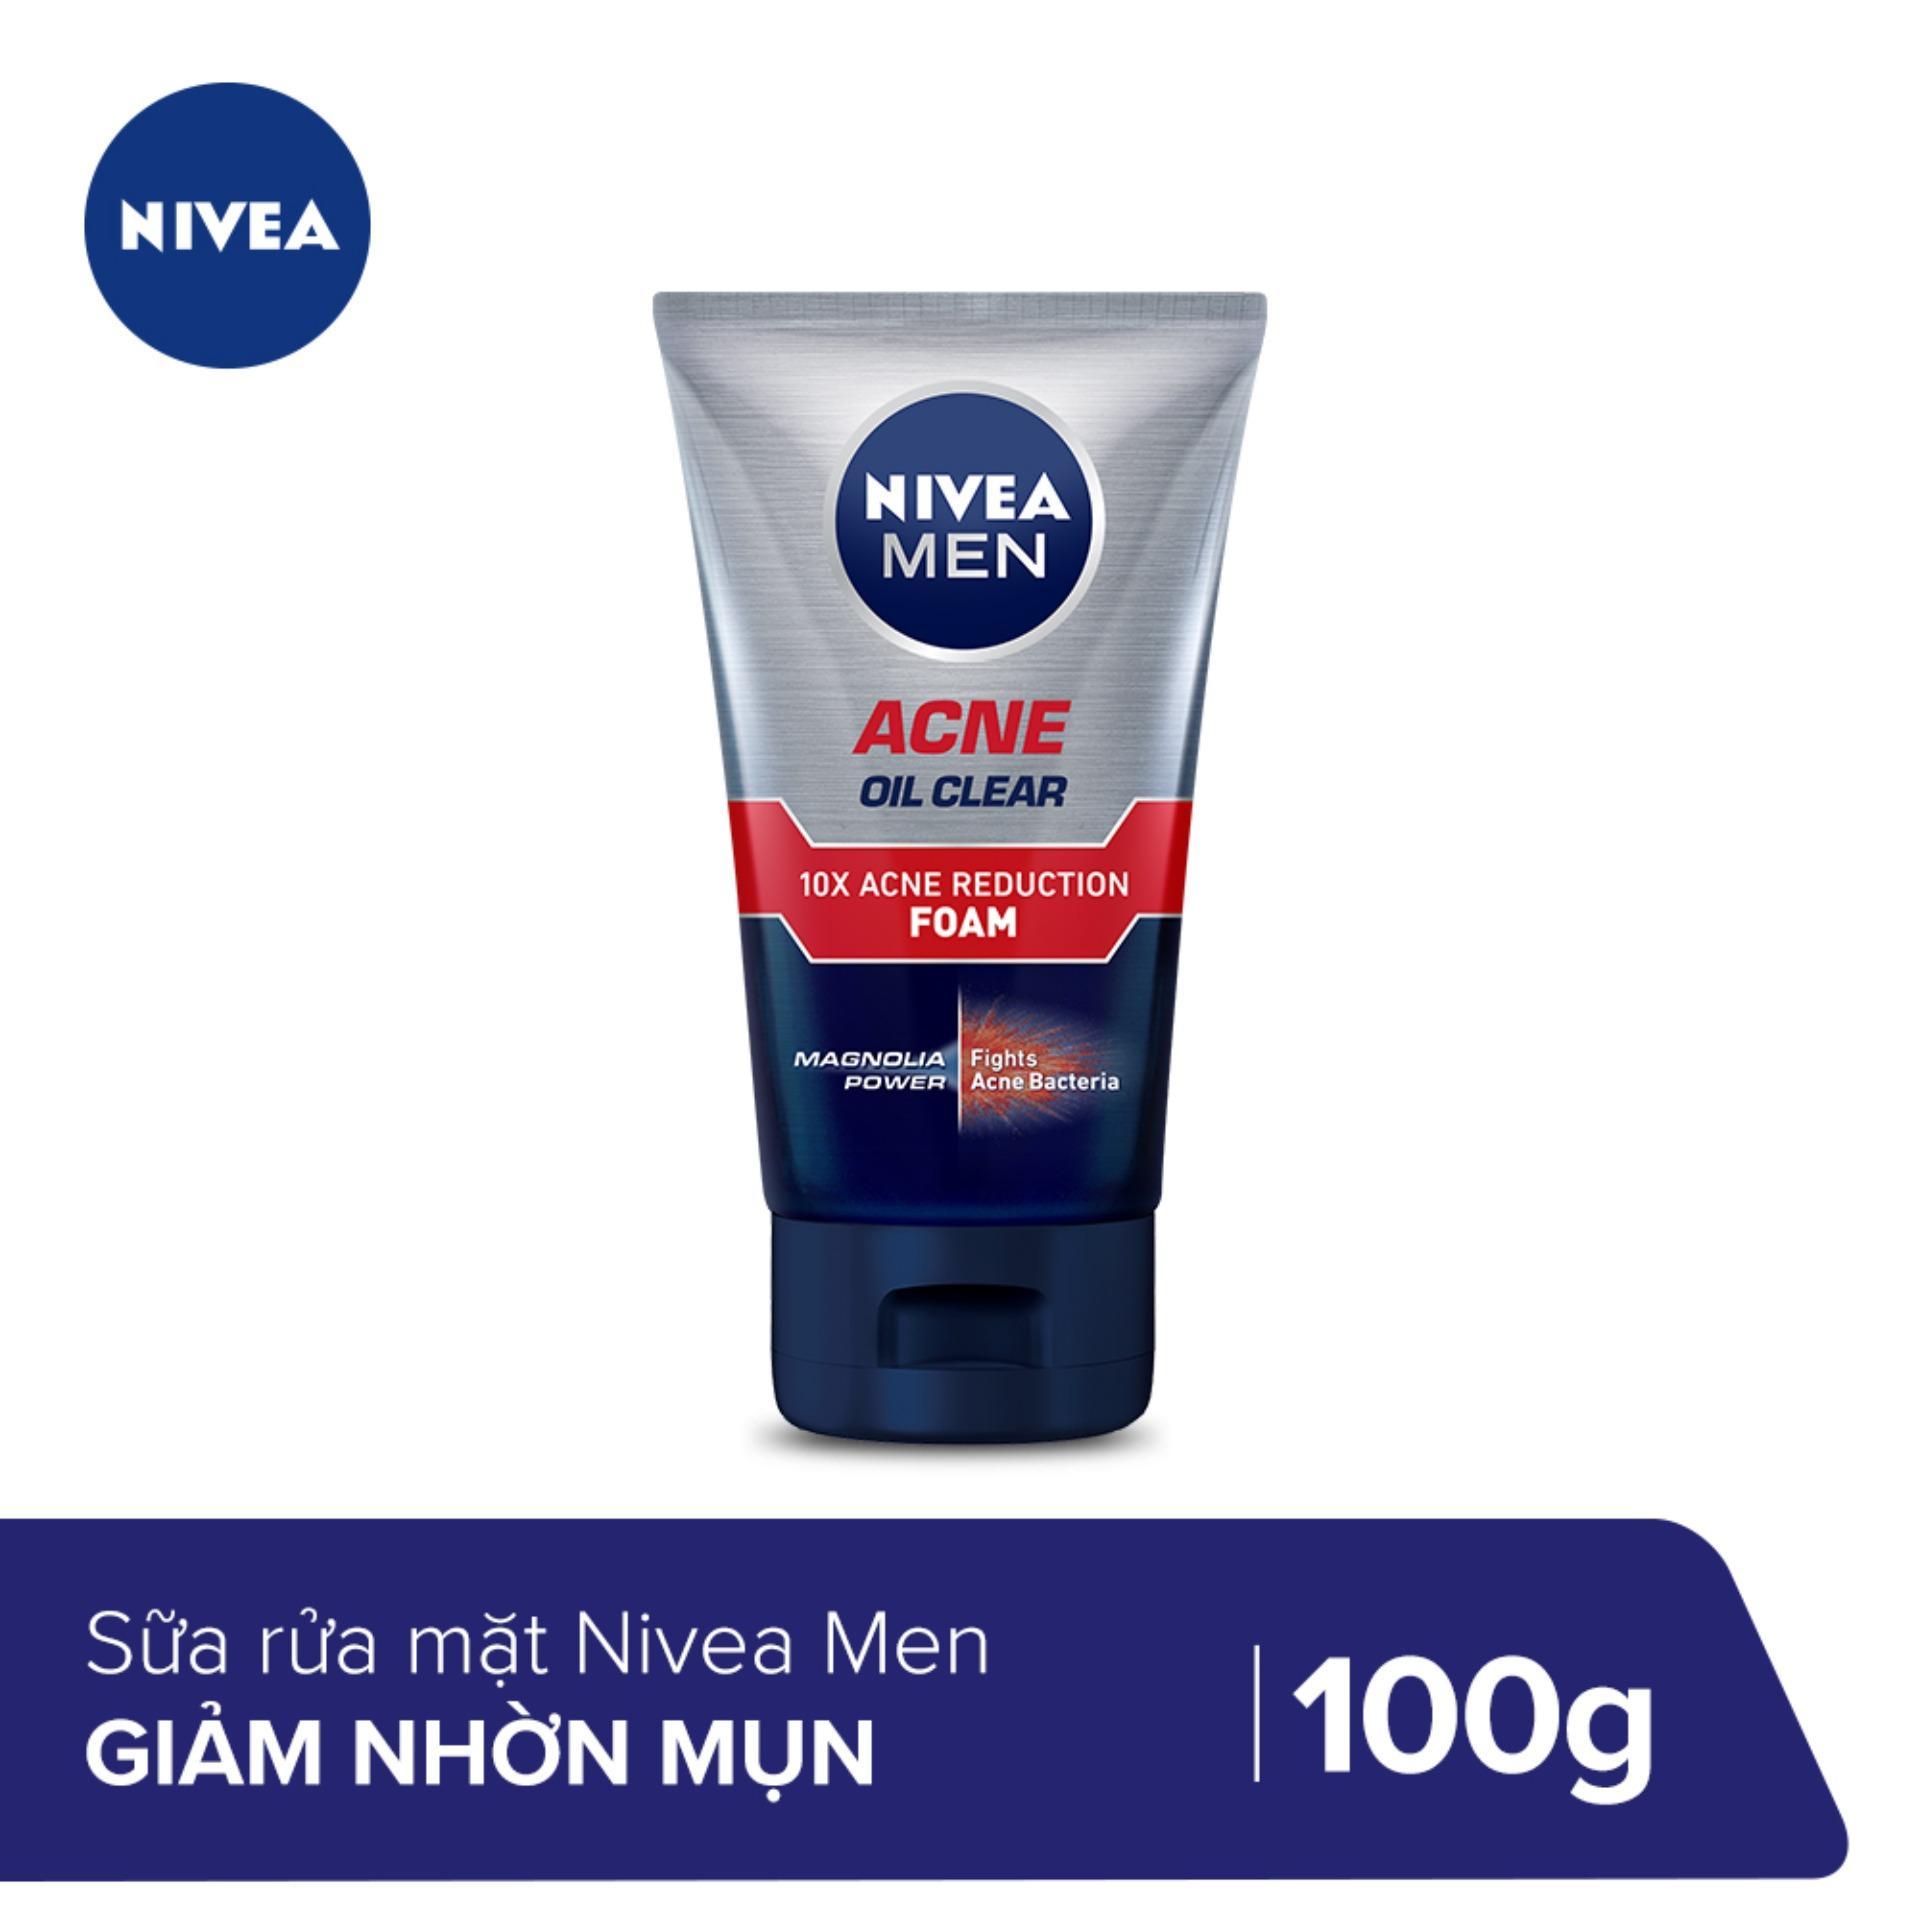 Sữa rửa mặt Nivea men giúp giảm nhờn mụn 100g_82378